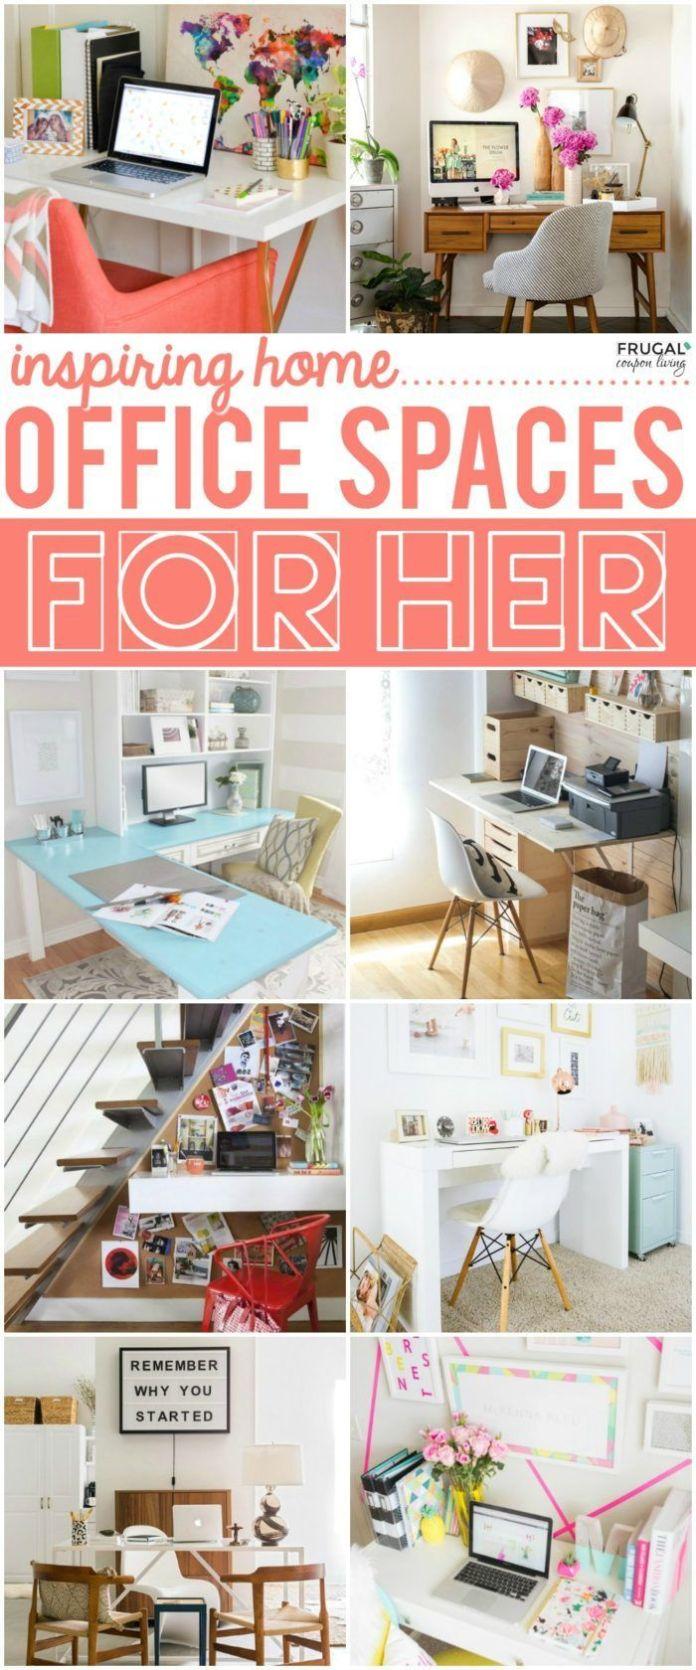 Best Diy Crafts Ideas Inspiring Home Office Decor Ideas For Her Office Decorating Ideas Office Organ Diy Loop Leading Diy Craft Inspiration Magazine Database